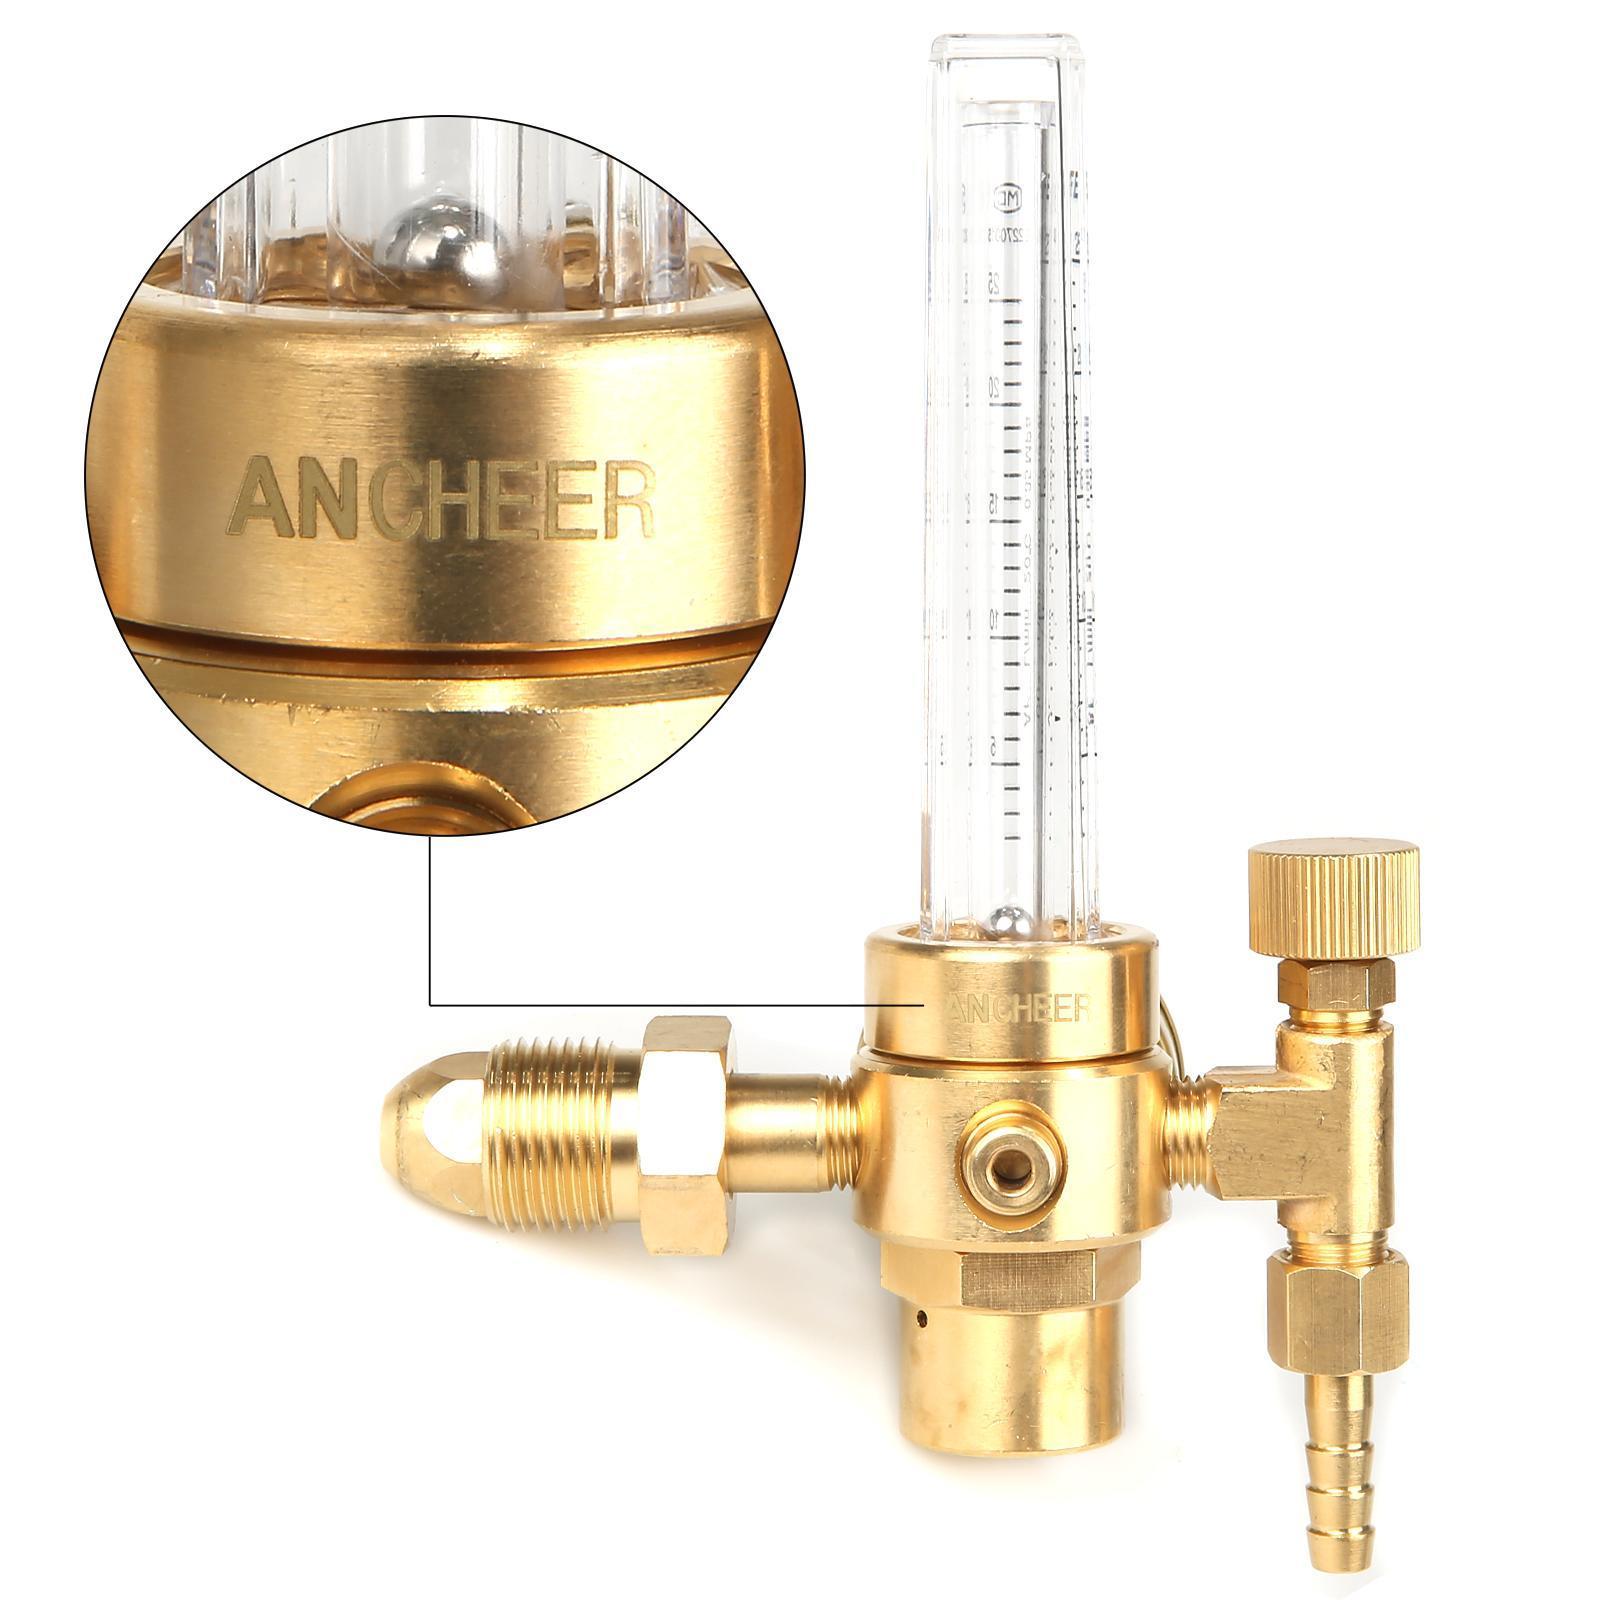 Universal Copper Argon CO2 Regulator Flowmeter Gas Pressure Gauge 1